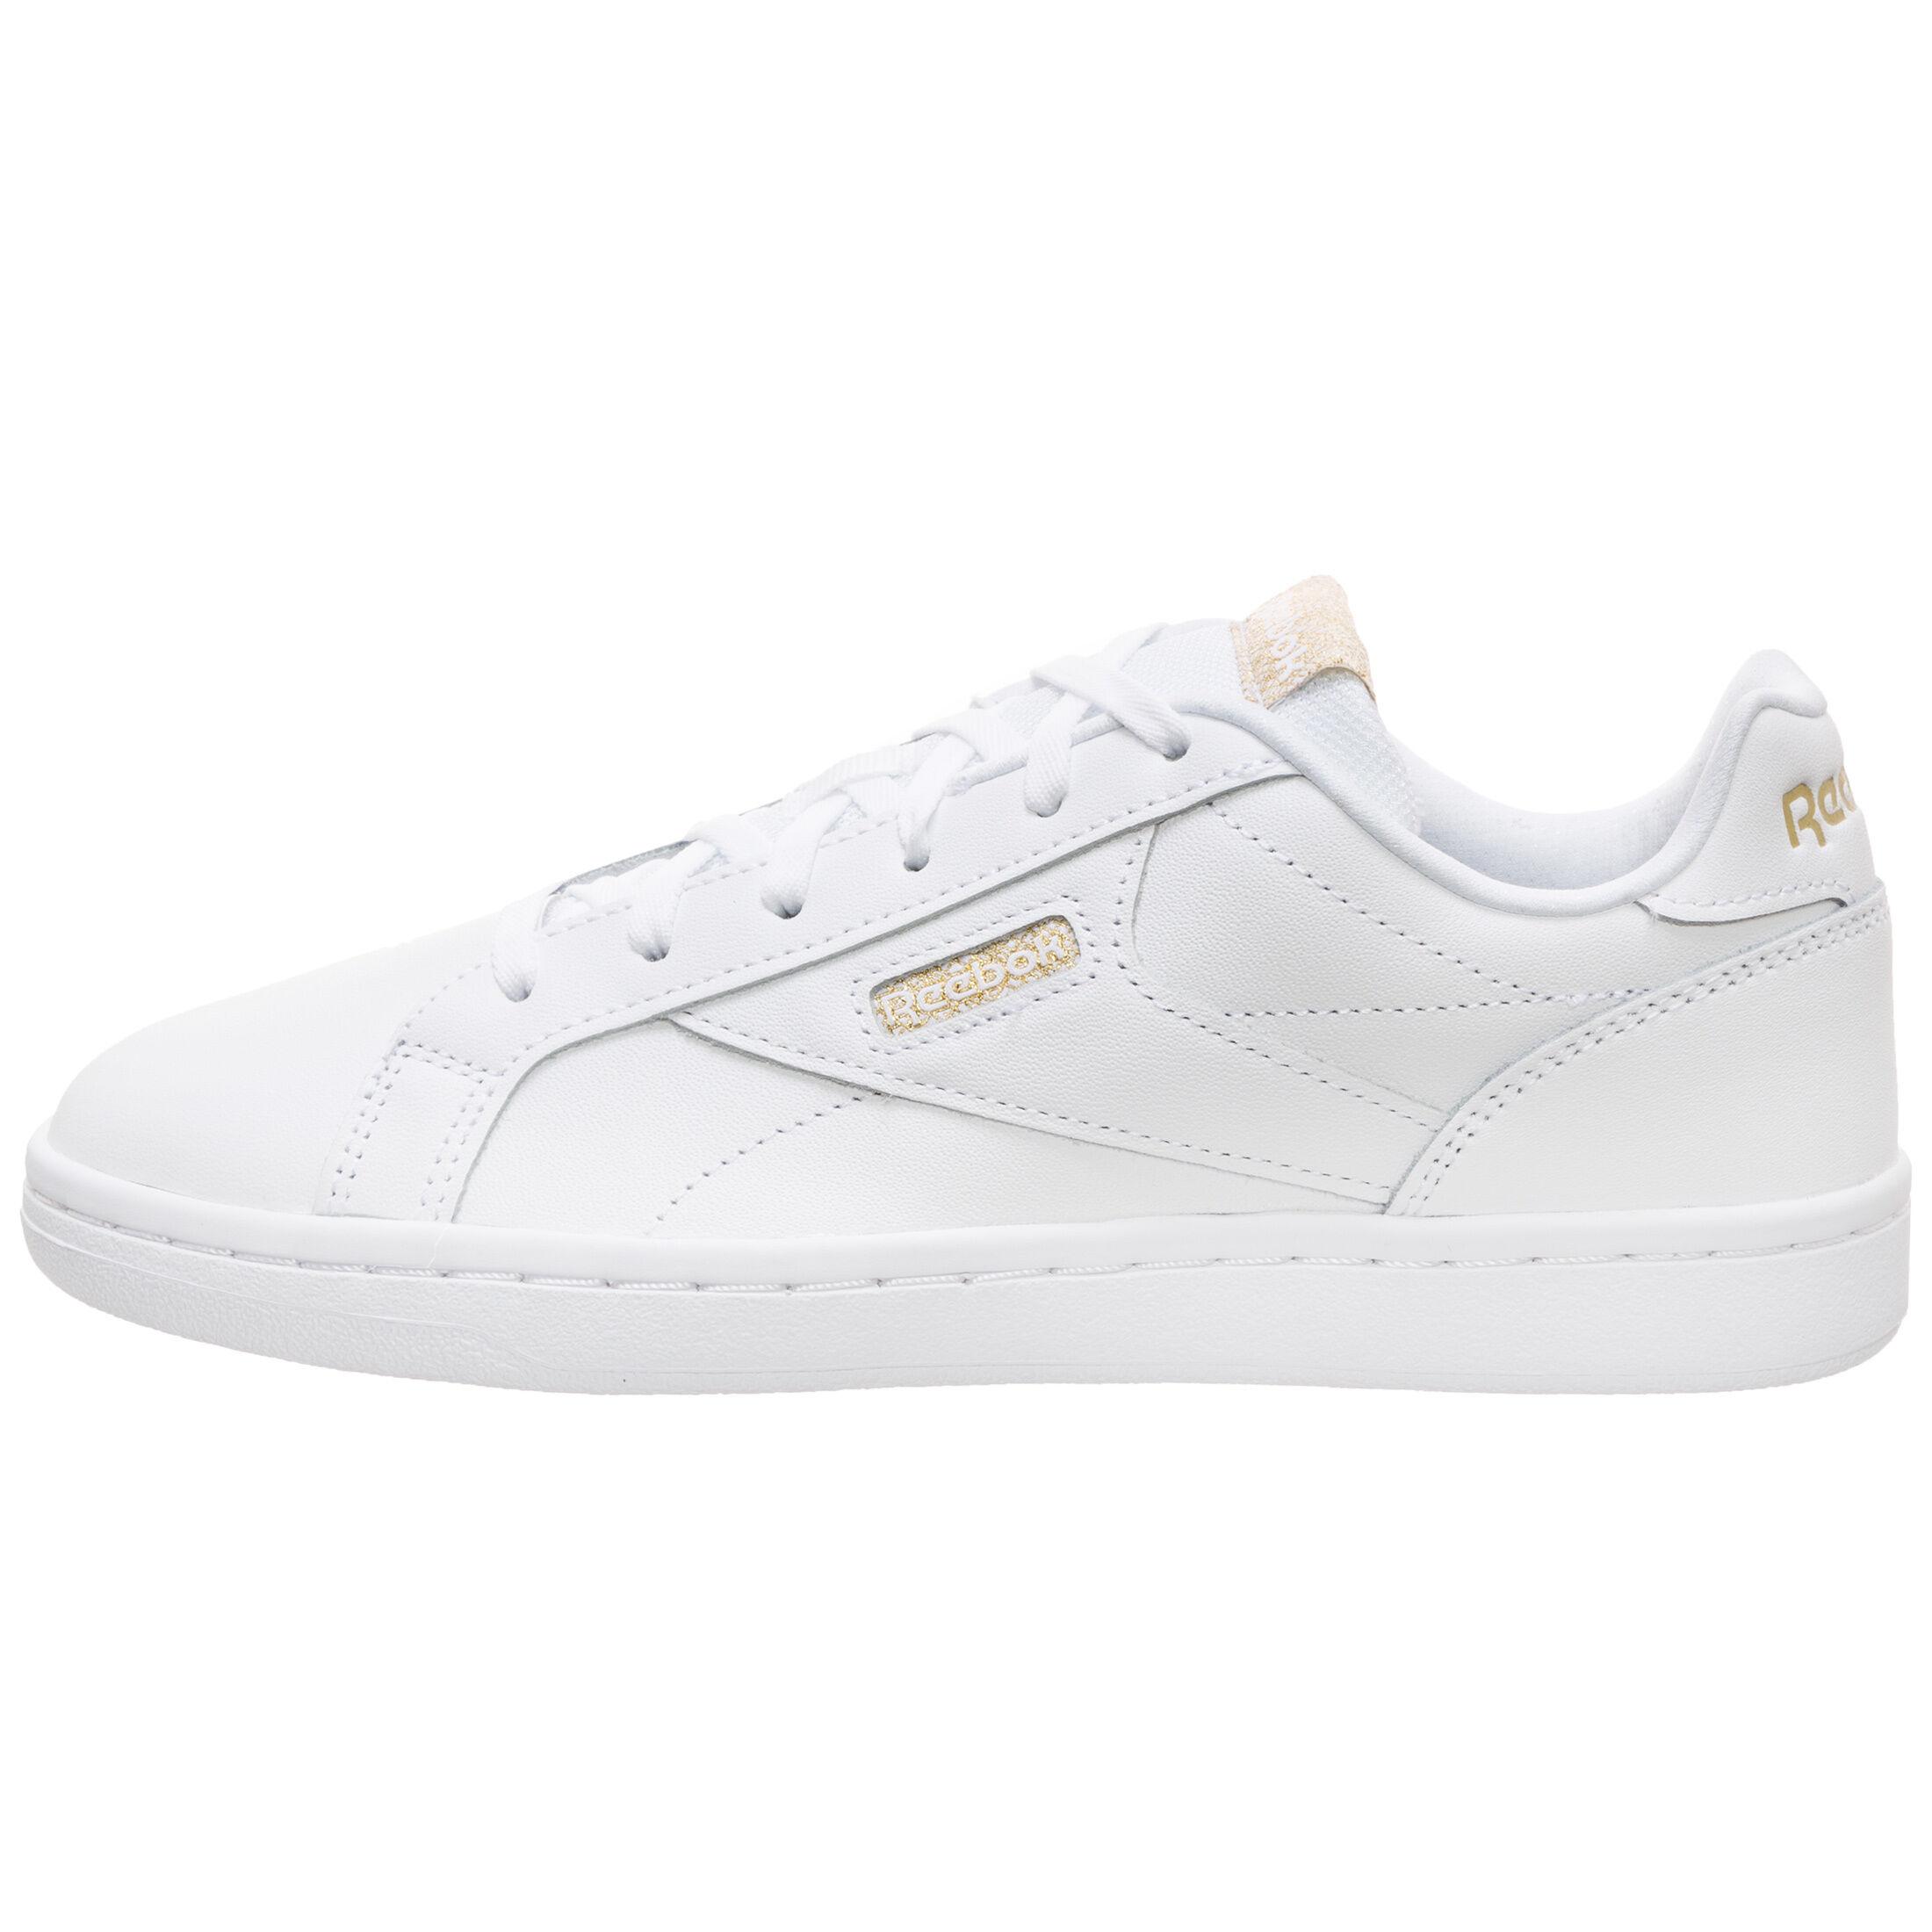 Reebok Royal Complete Clean LX Sneaker Damen bei OUTFITTER